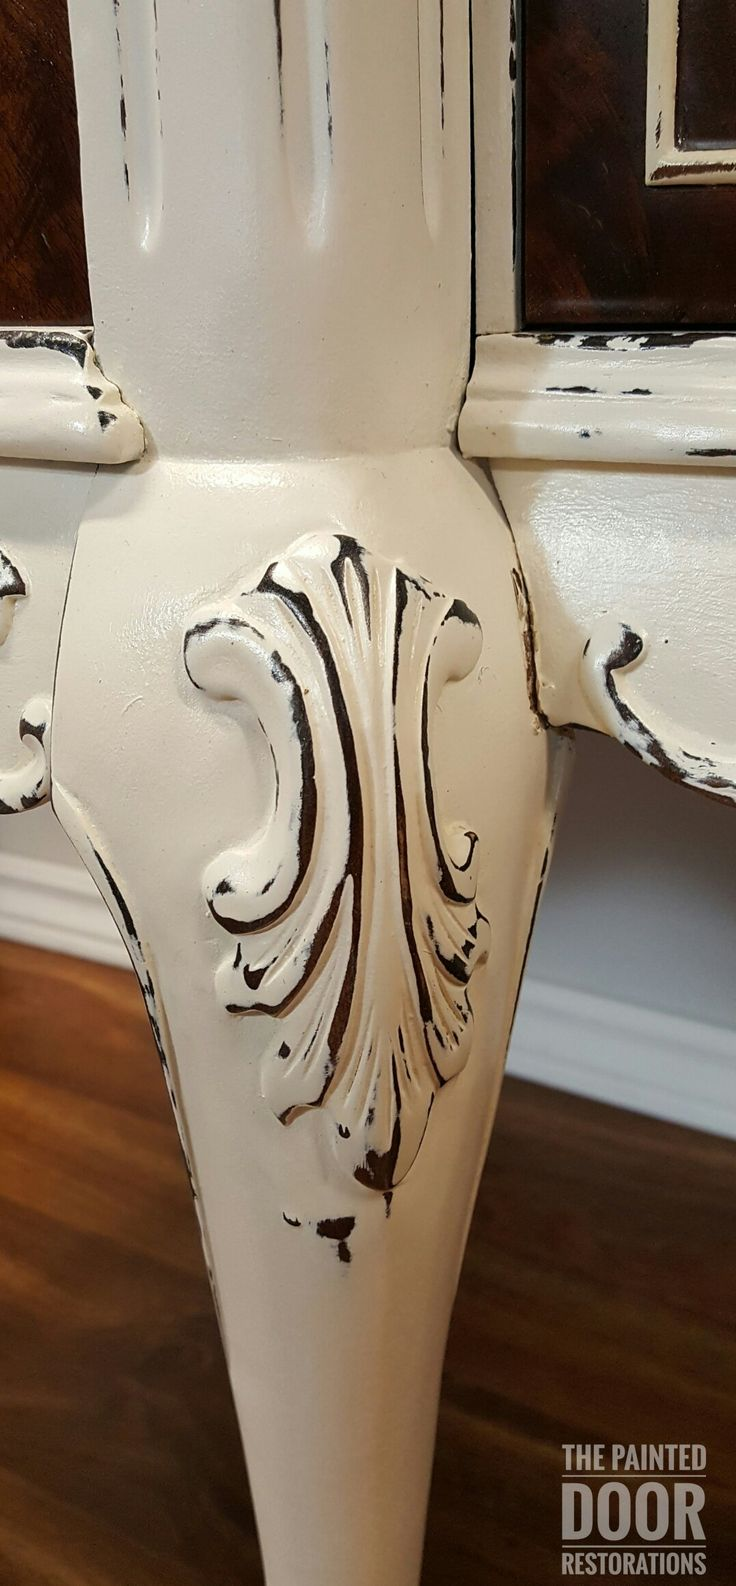 Antique Claw Foot Sideboard  www.thepainteddoorrestorations.com  www.facebook.com/thepainteddoorrestorations  www.instagram.com/thepainteddoorrestorations  Pinterest: The Painted Door Restorations  #paintedfurniture #cottagepaint #cottagewhite #distressed #distressed  #sideboard #sideboards #sideserver #sideservers #diningroom #diningroomdecor #diningroomfurniture #clawfoot #burl #burledwood #burled #